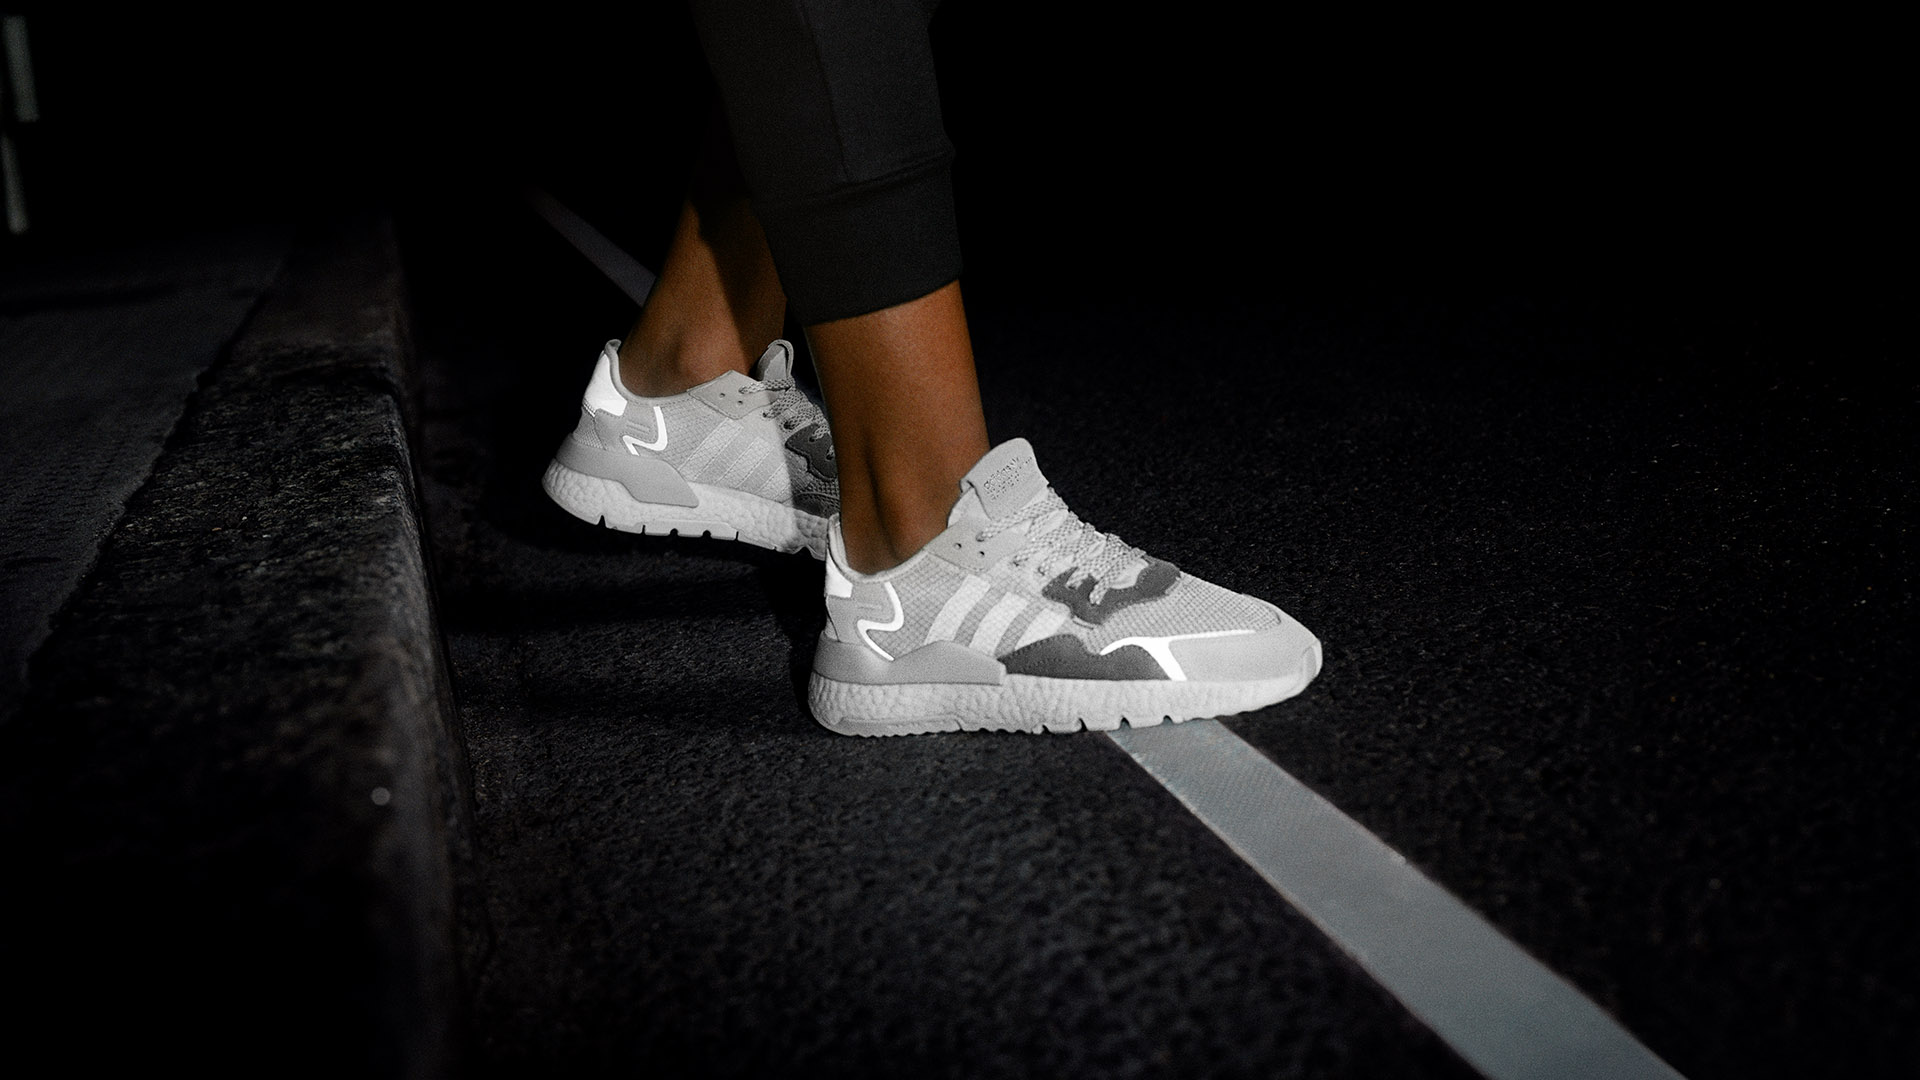 adidas model 2019